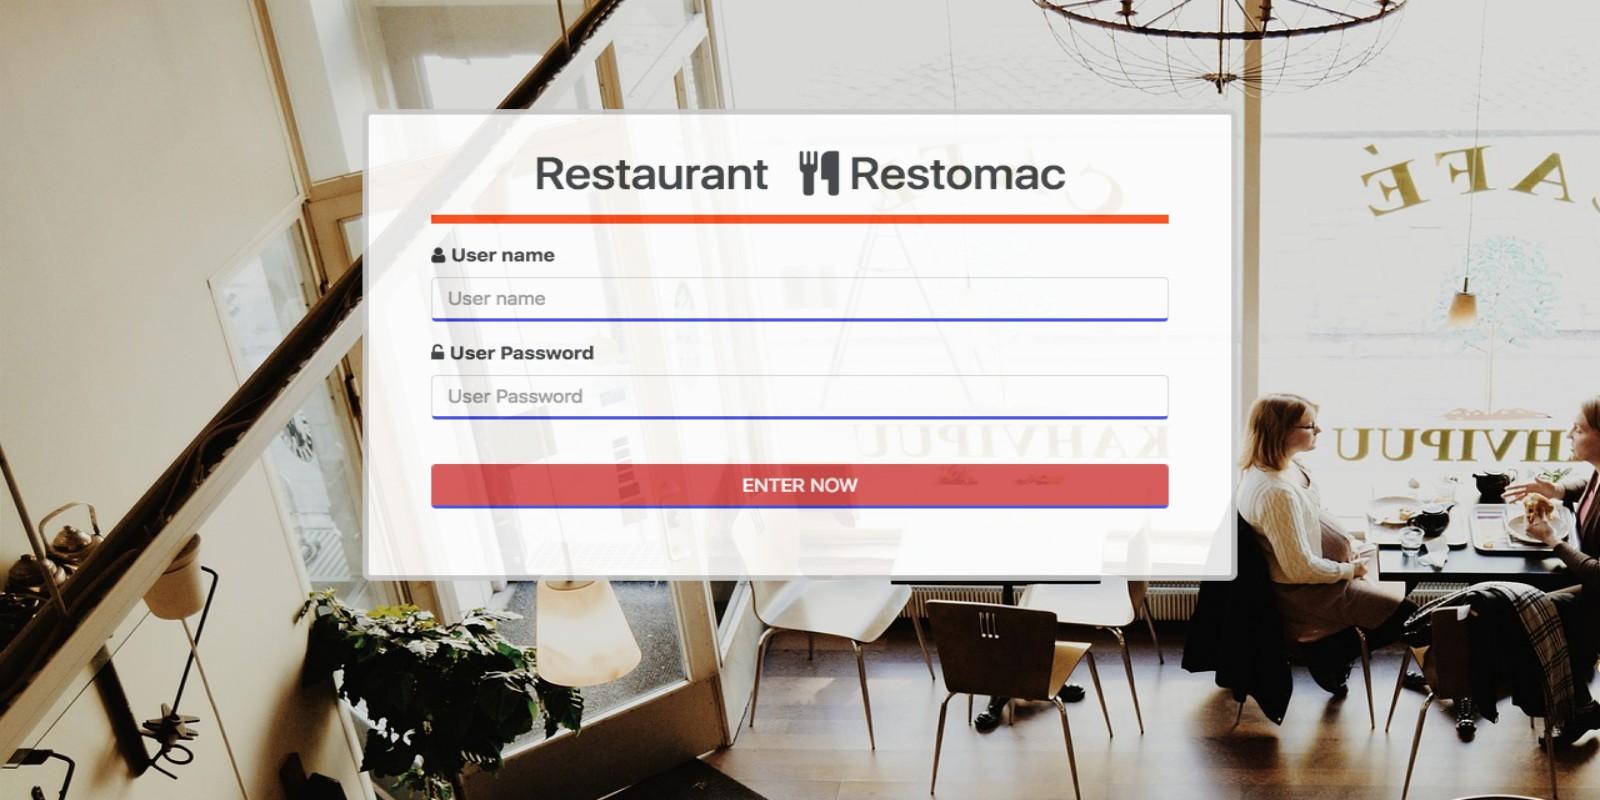 Restomac - Restaurant Reservation System PHP